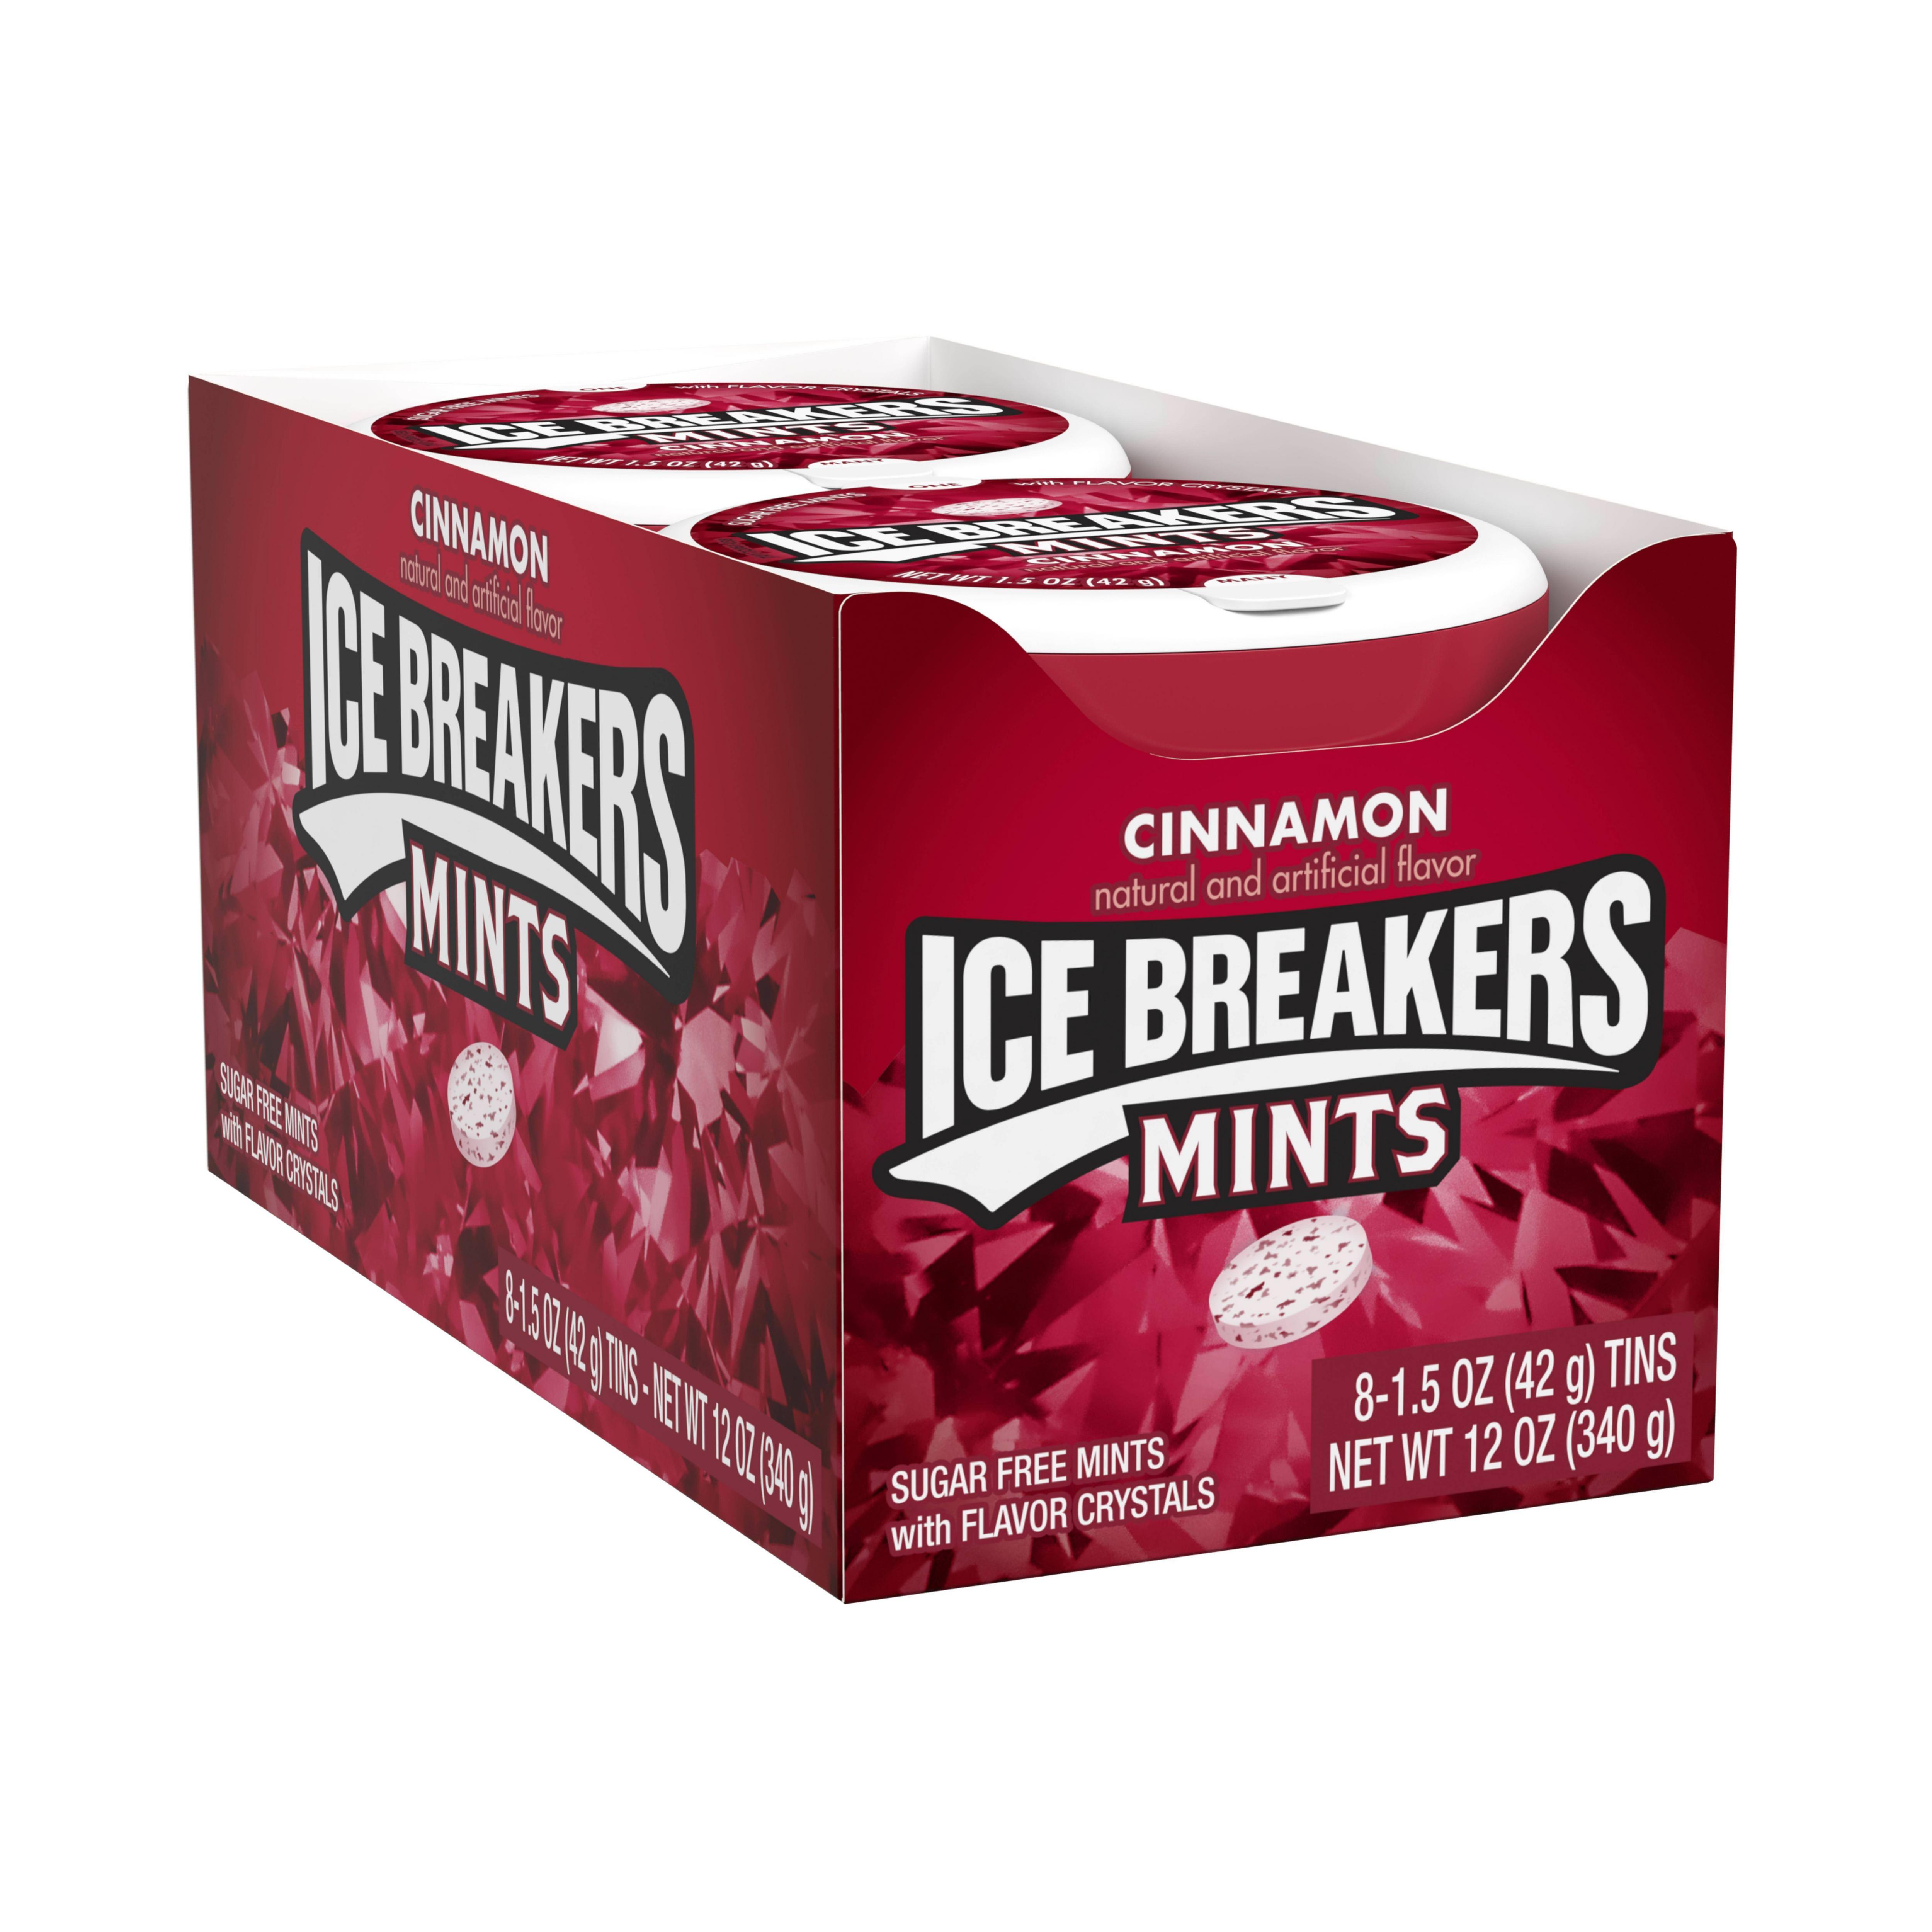 Ice Breakers, Sugar Free Cinnamon Breath Mints, 1.5 Oz, 8 Ct